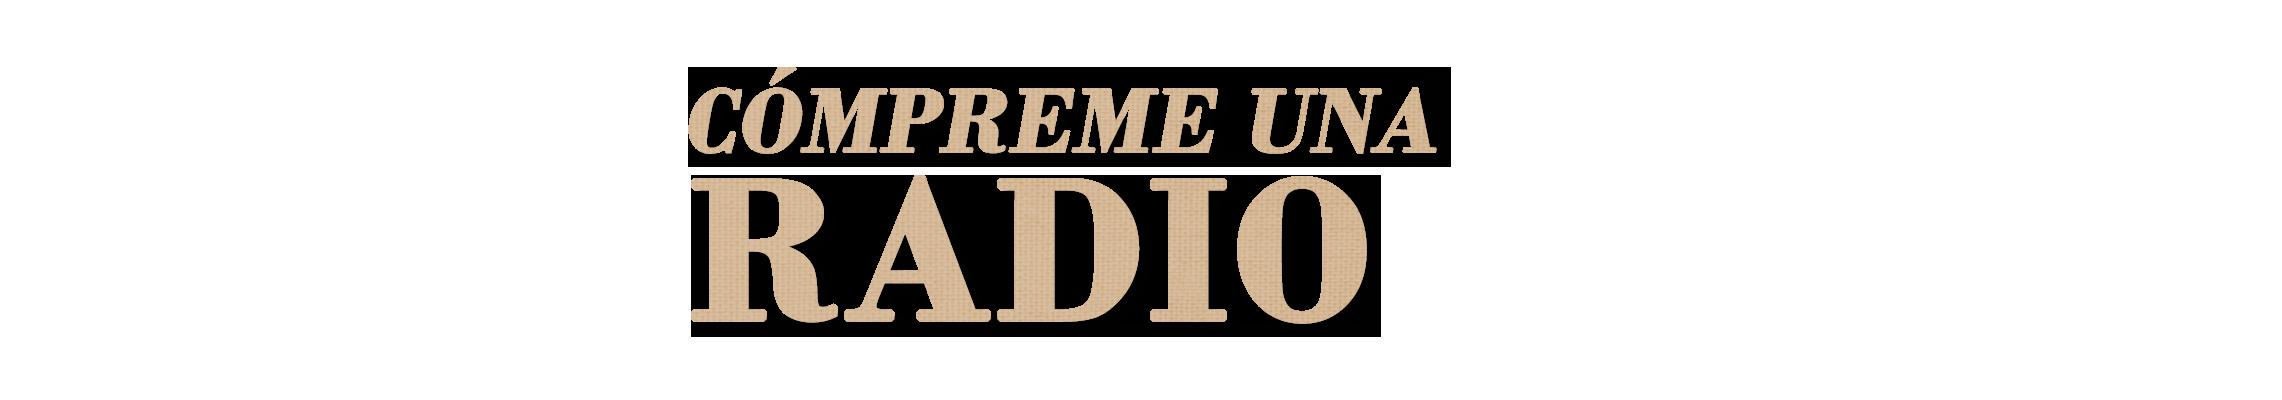 Compreme una Radio